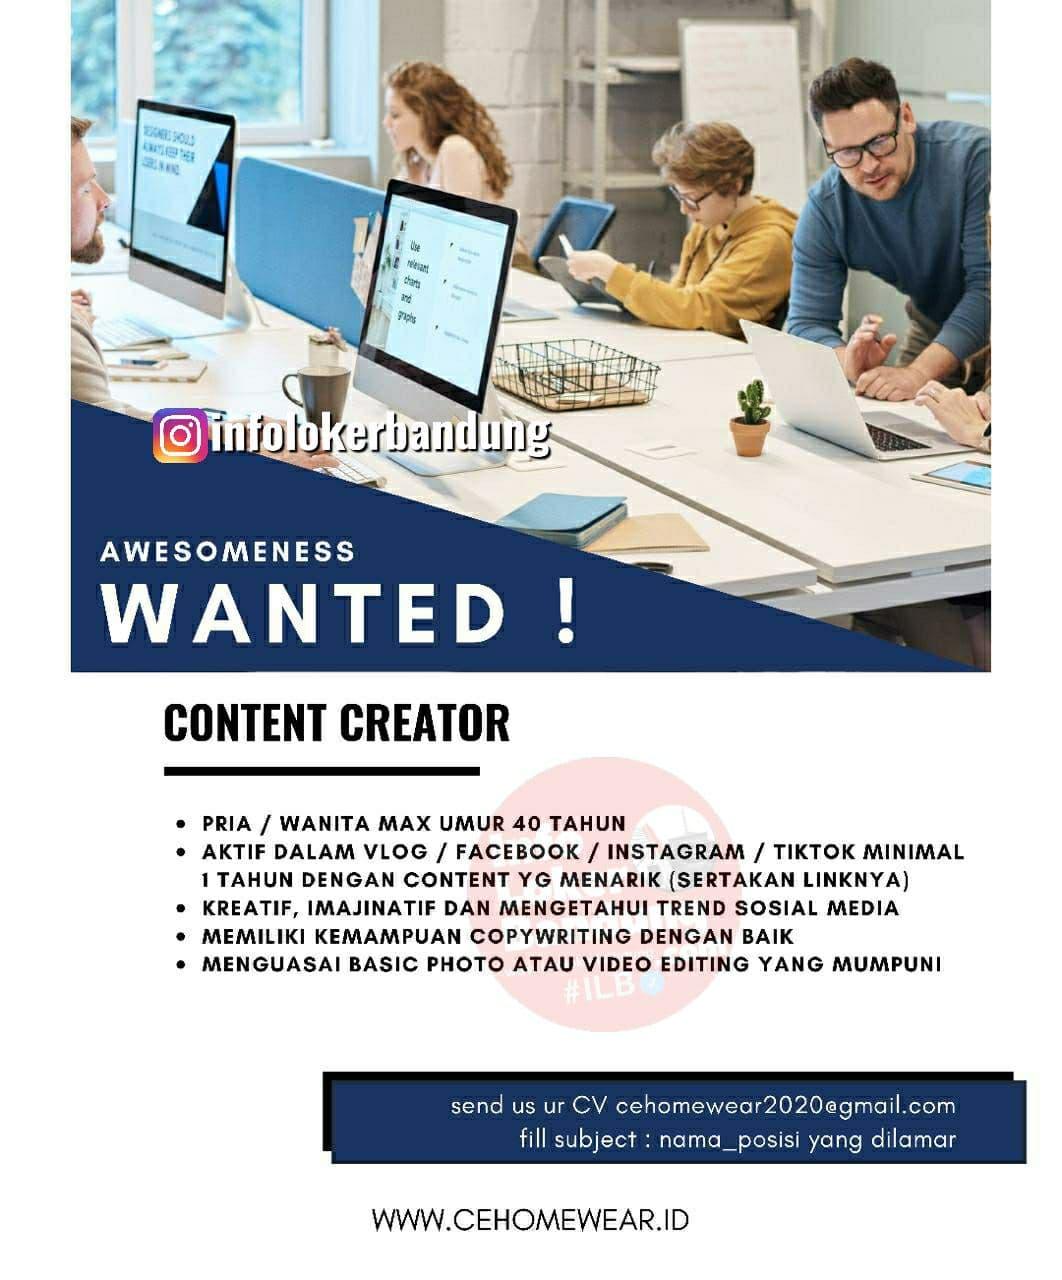 Lowongan Kerja Content Creator Cehomewear Bandung Juli 2021